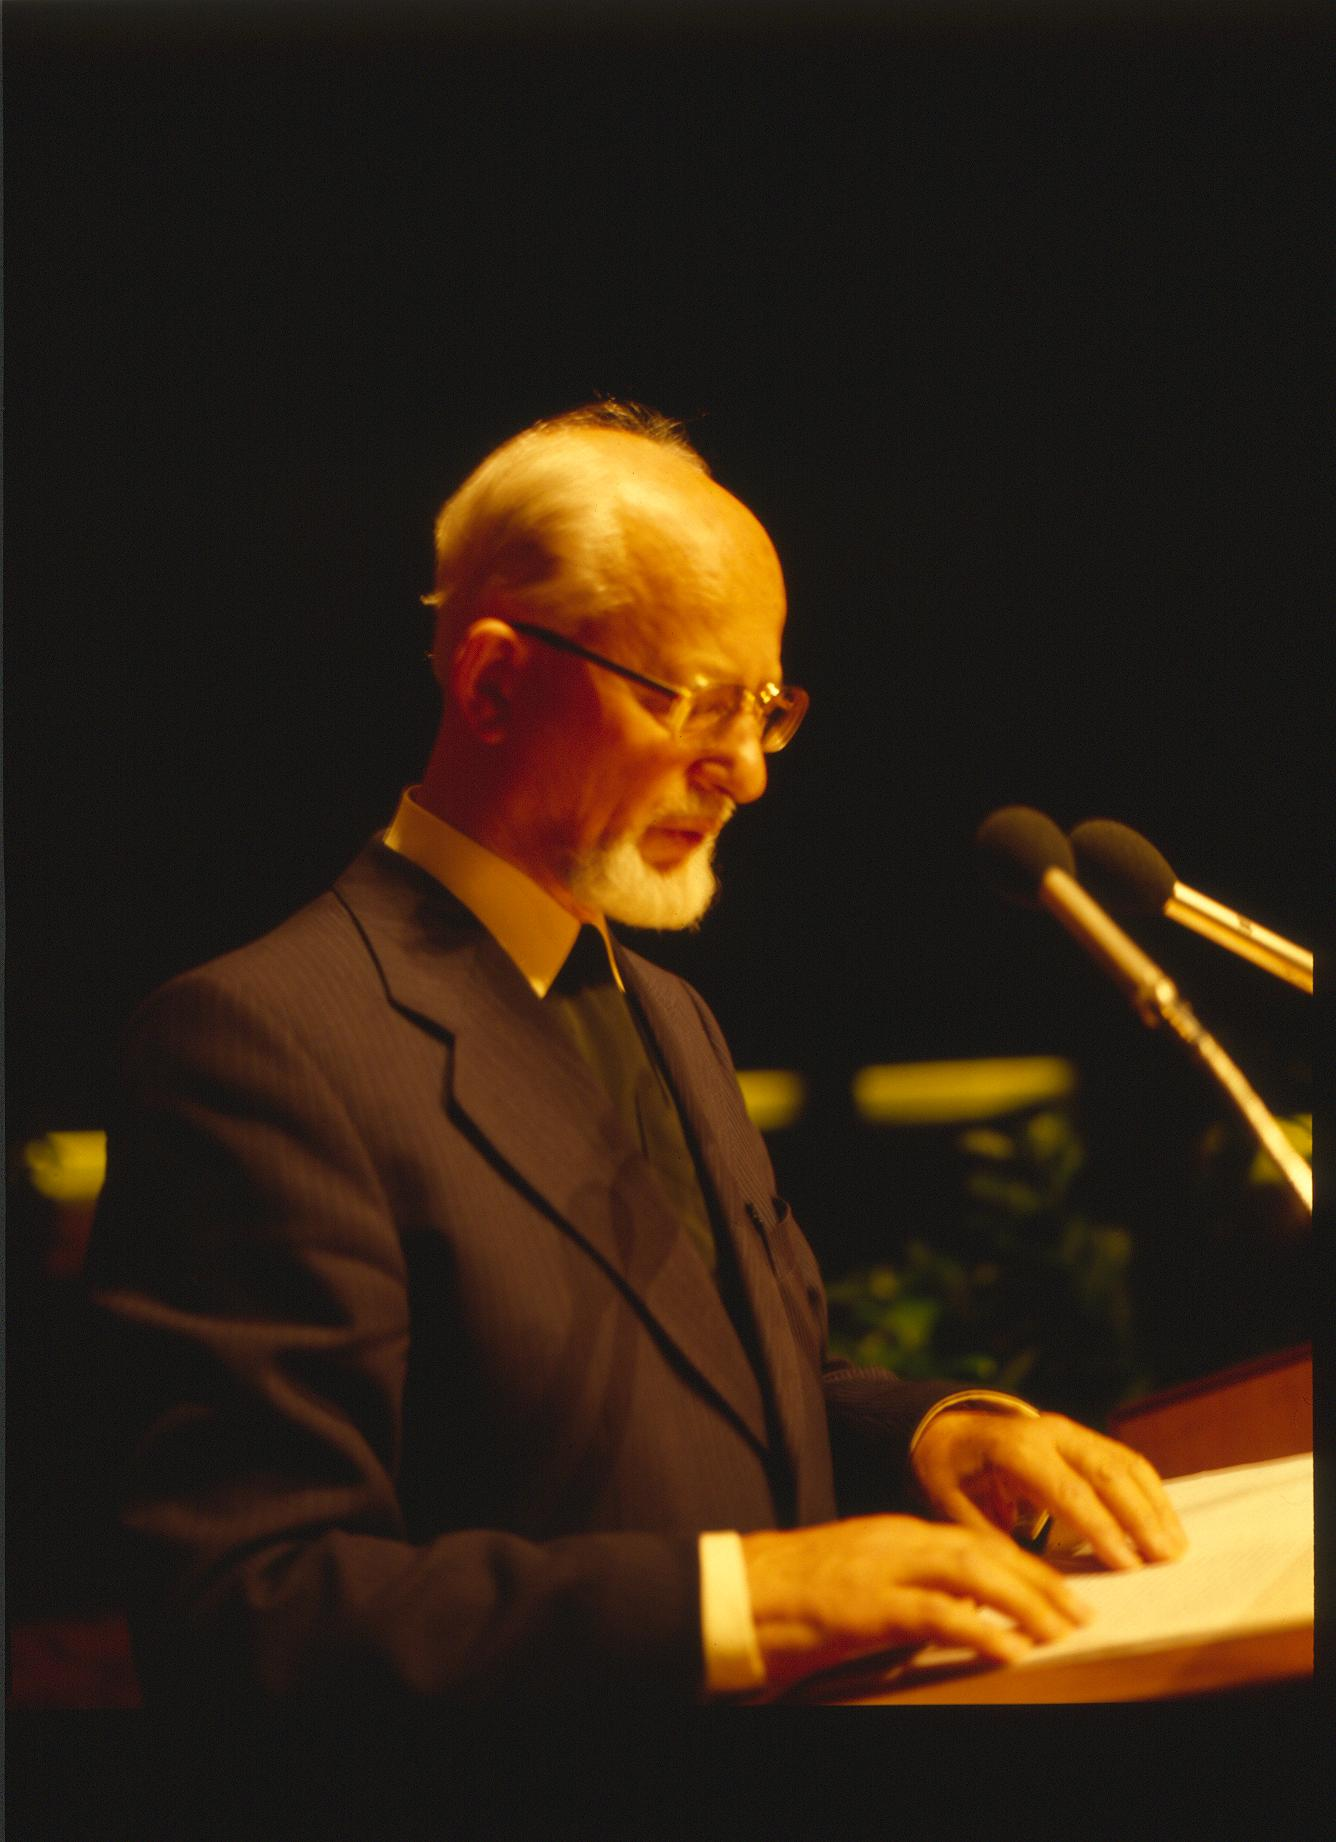 X. Imago Mundi-Kongress 1985, Innsbruck, Prof. DDr. Klaus Schedl